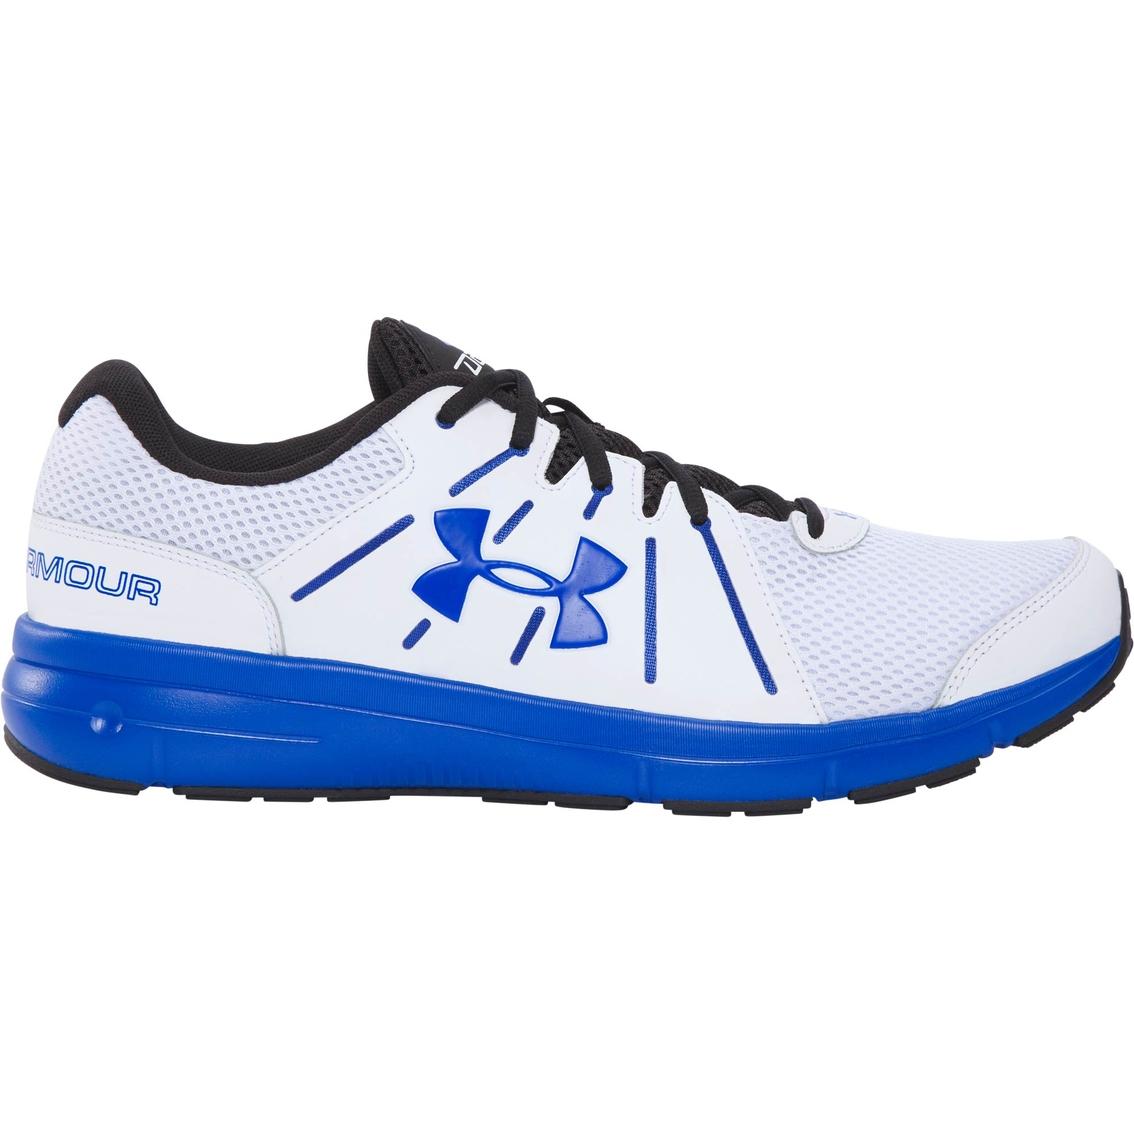 watch 0194e 49d73 Under Armour Men's Dash Rn 2 Running Shoes | Running | Shoes ...